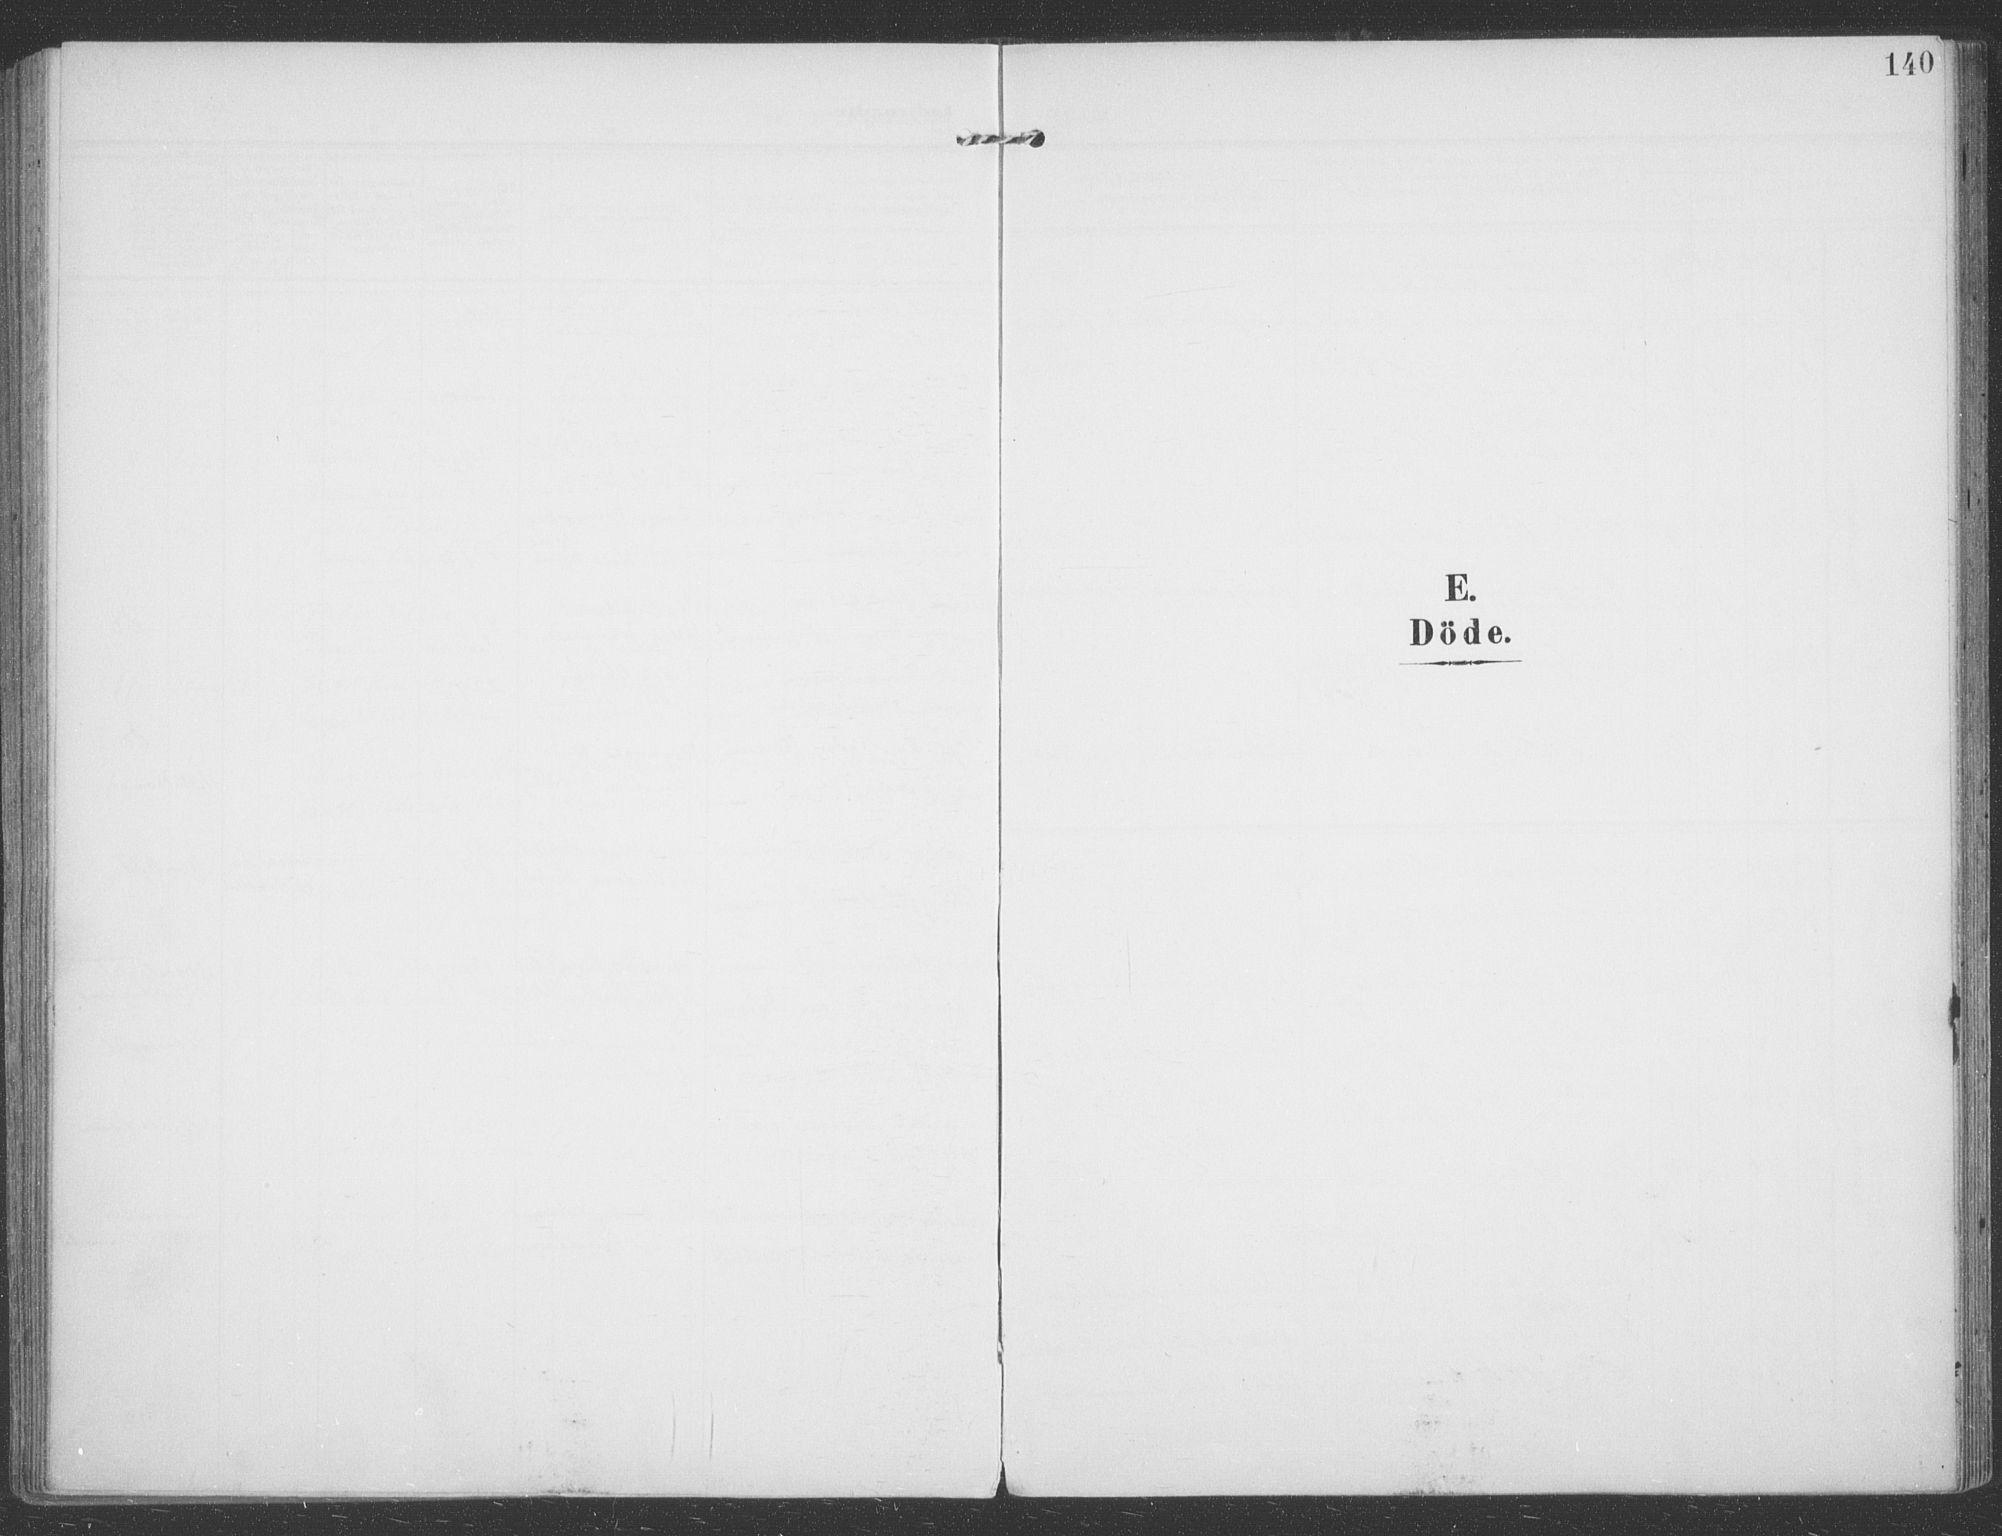 SATØ, Talvik sokneprestkontor, H/Ha/L0017kirke: Ministerialbok nr. 17, 1906-1915, s. 140